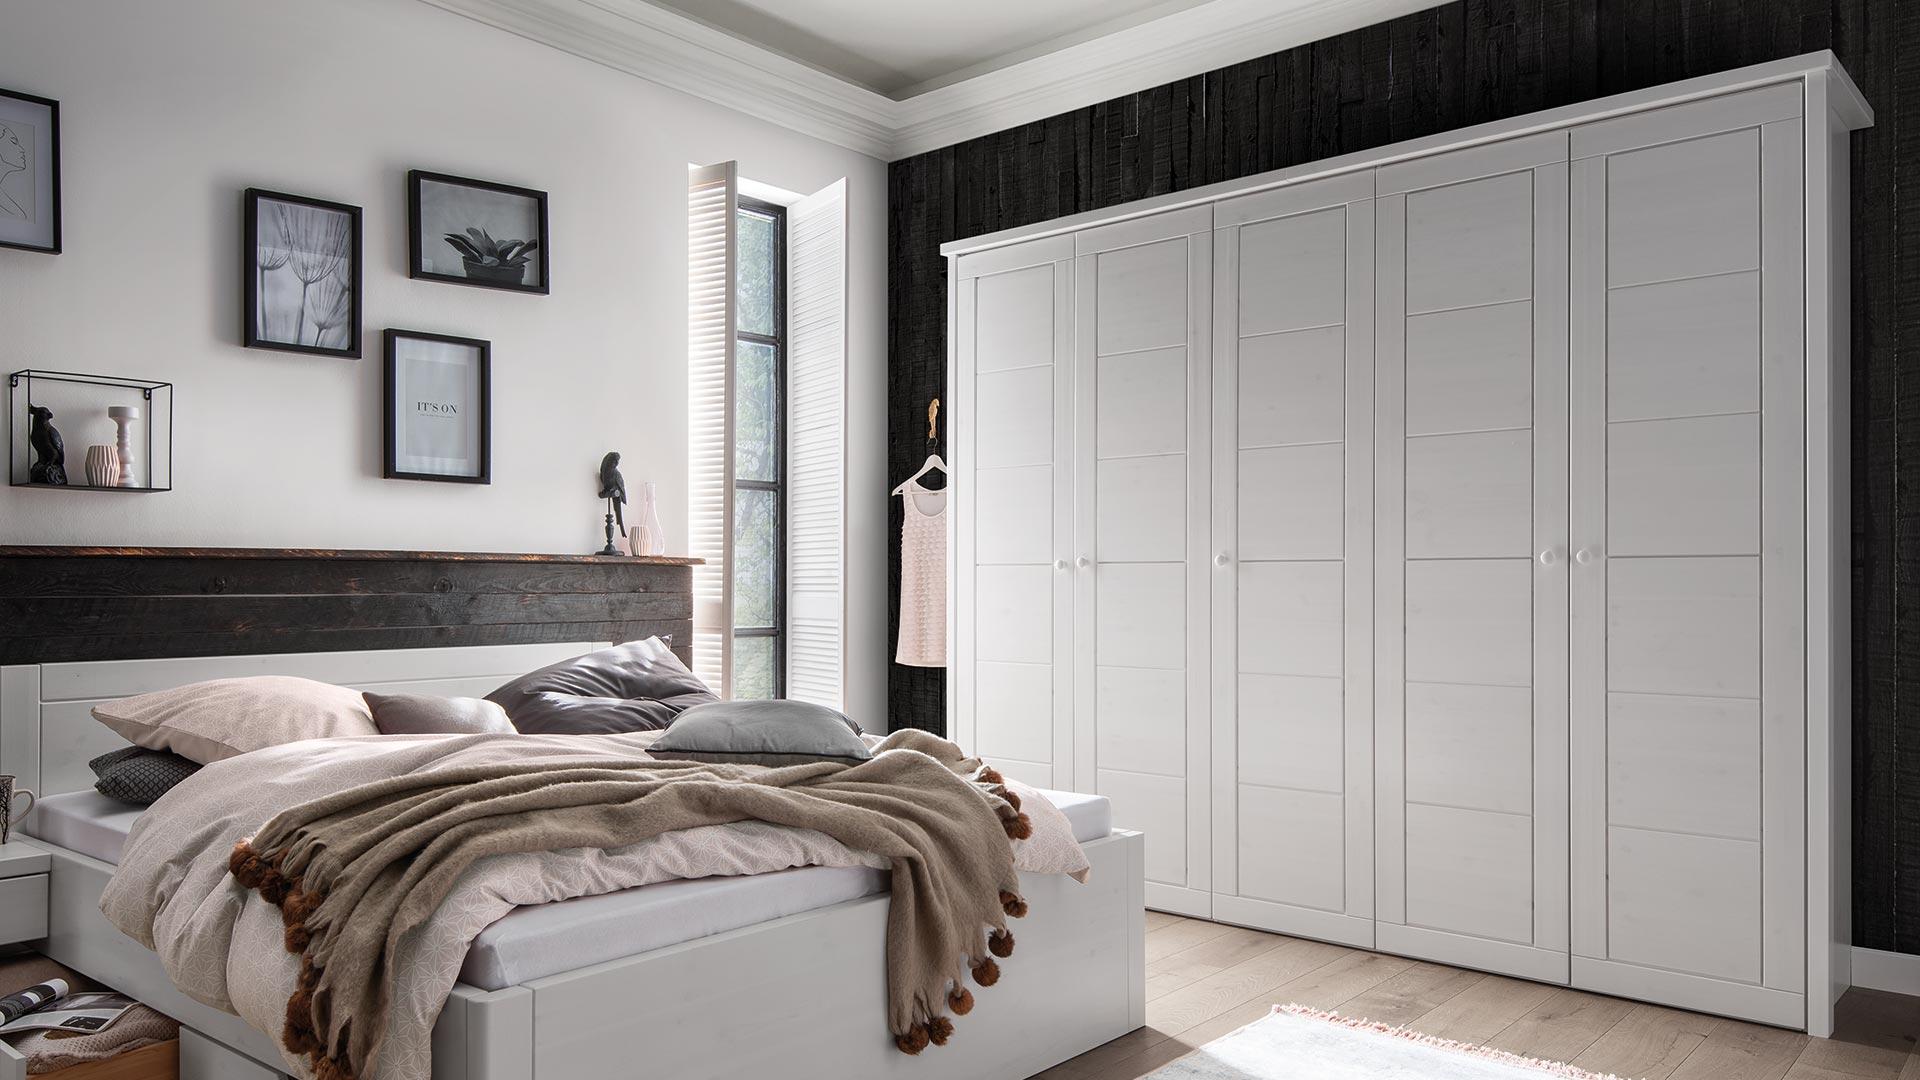 kleiderschrank ber 3 meter zuhause image idee. Black Bedroom Furniture Sets. Home Design Ideas